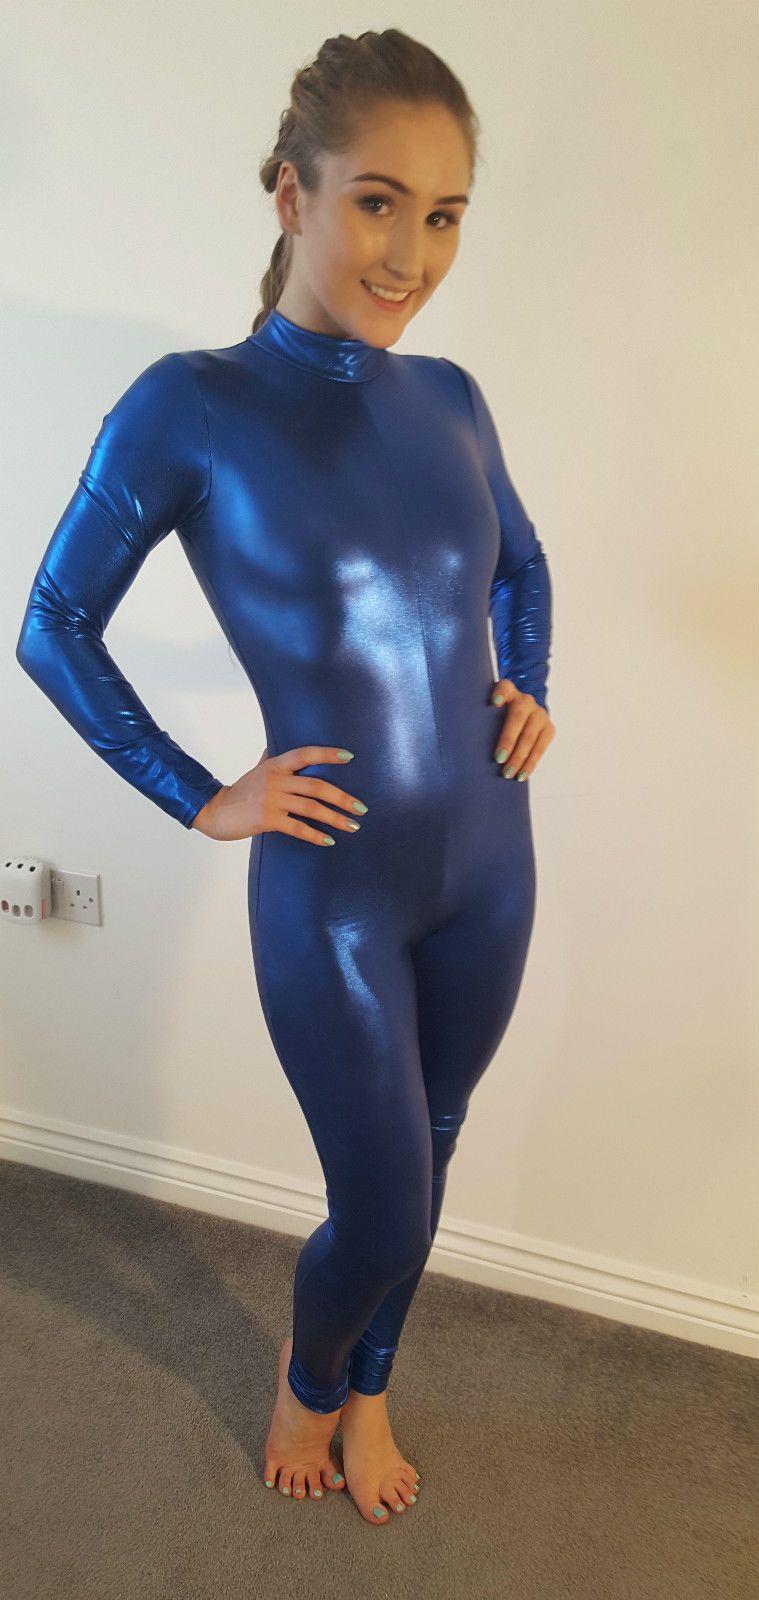 Rachelle 5 (2016) Aquablade Hydrasuit Adidas Shiny